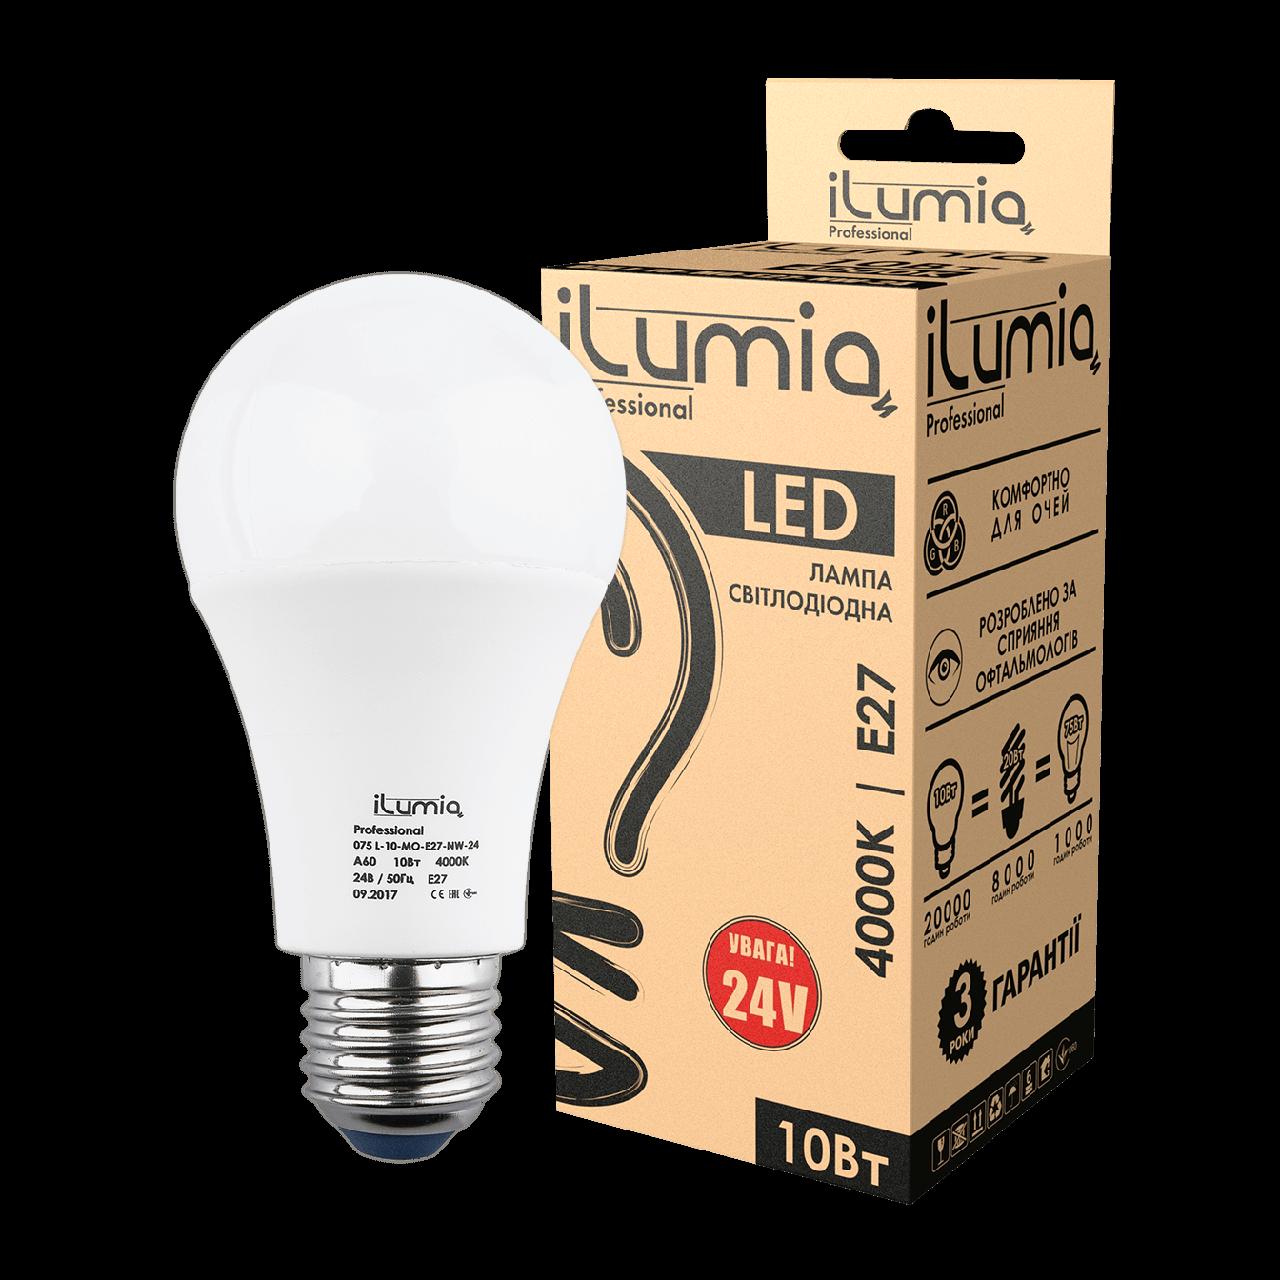 LED лампа Ilumia низковольтная 10W 24V Е27 A60 4000К нейтральный 1000Lm (075)